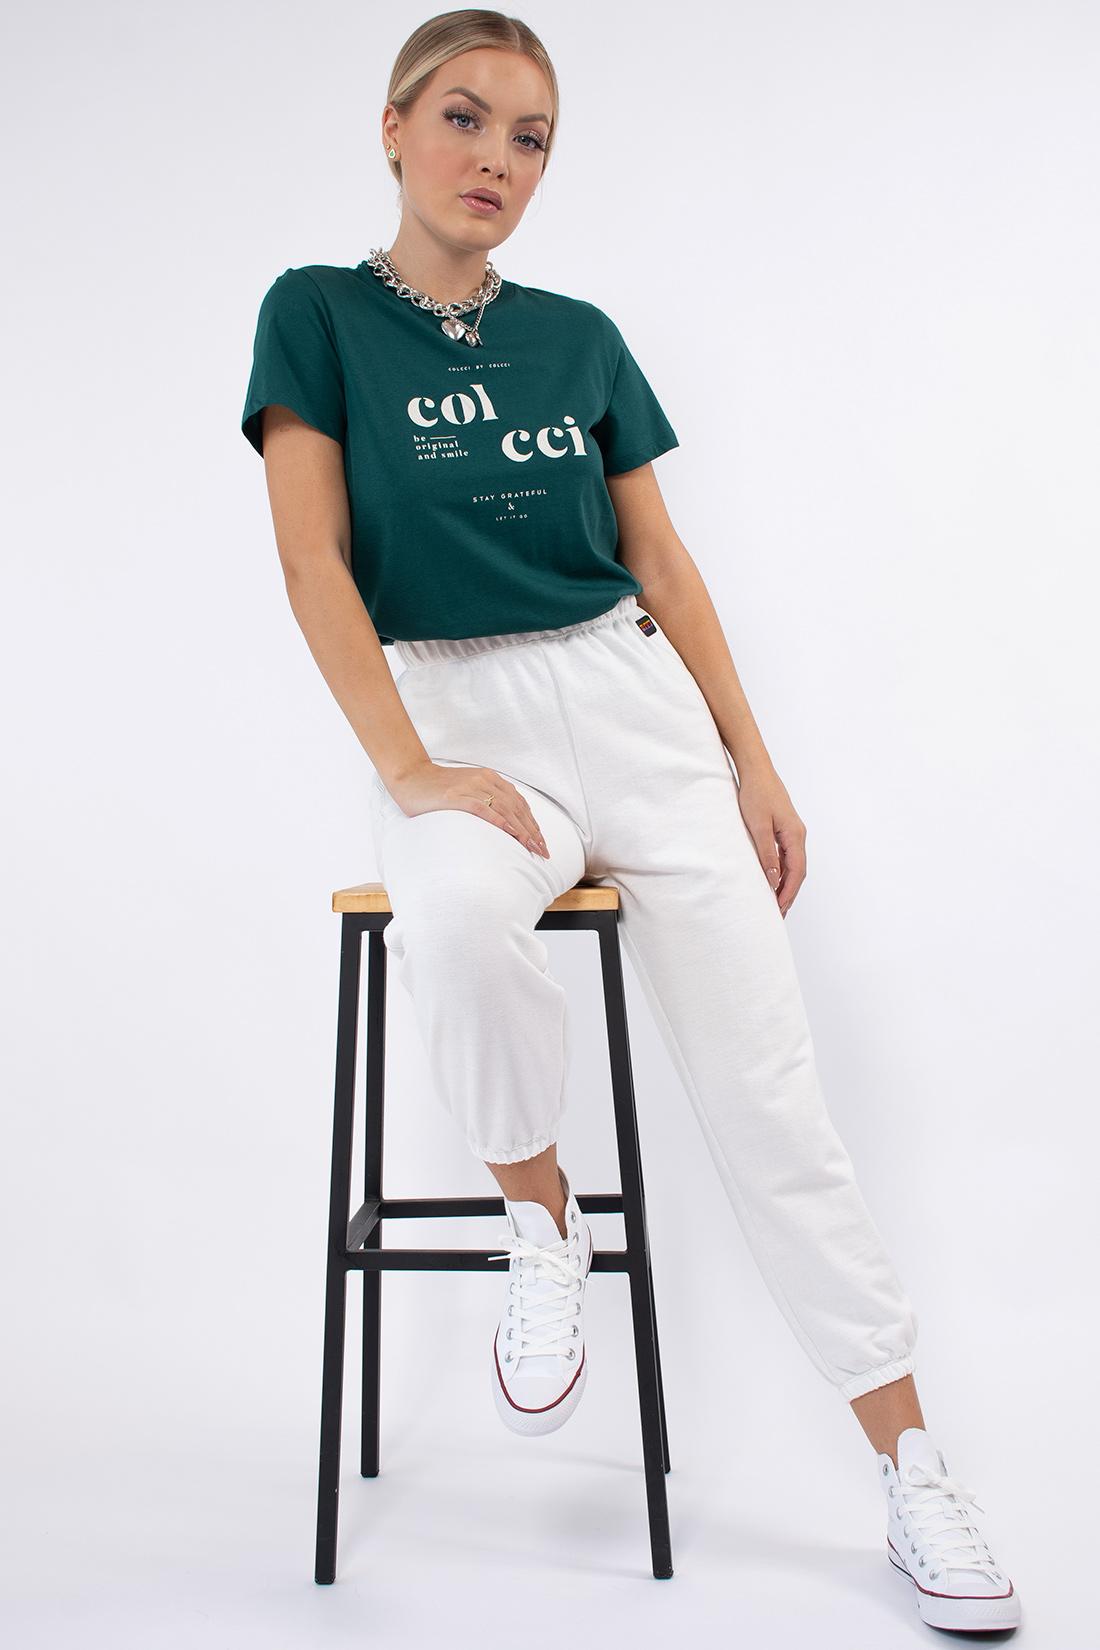 T Shirt Colcci Be Original And Smile